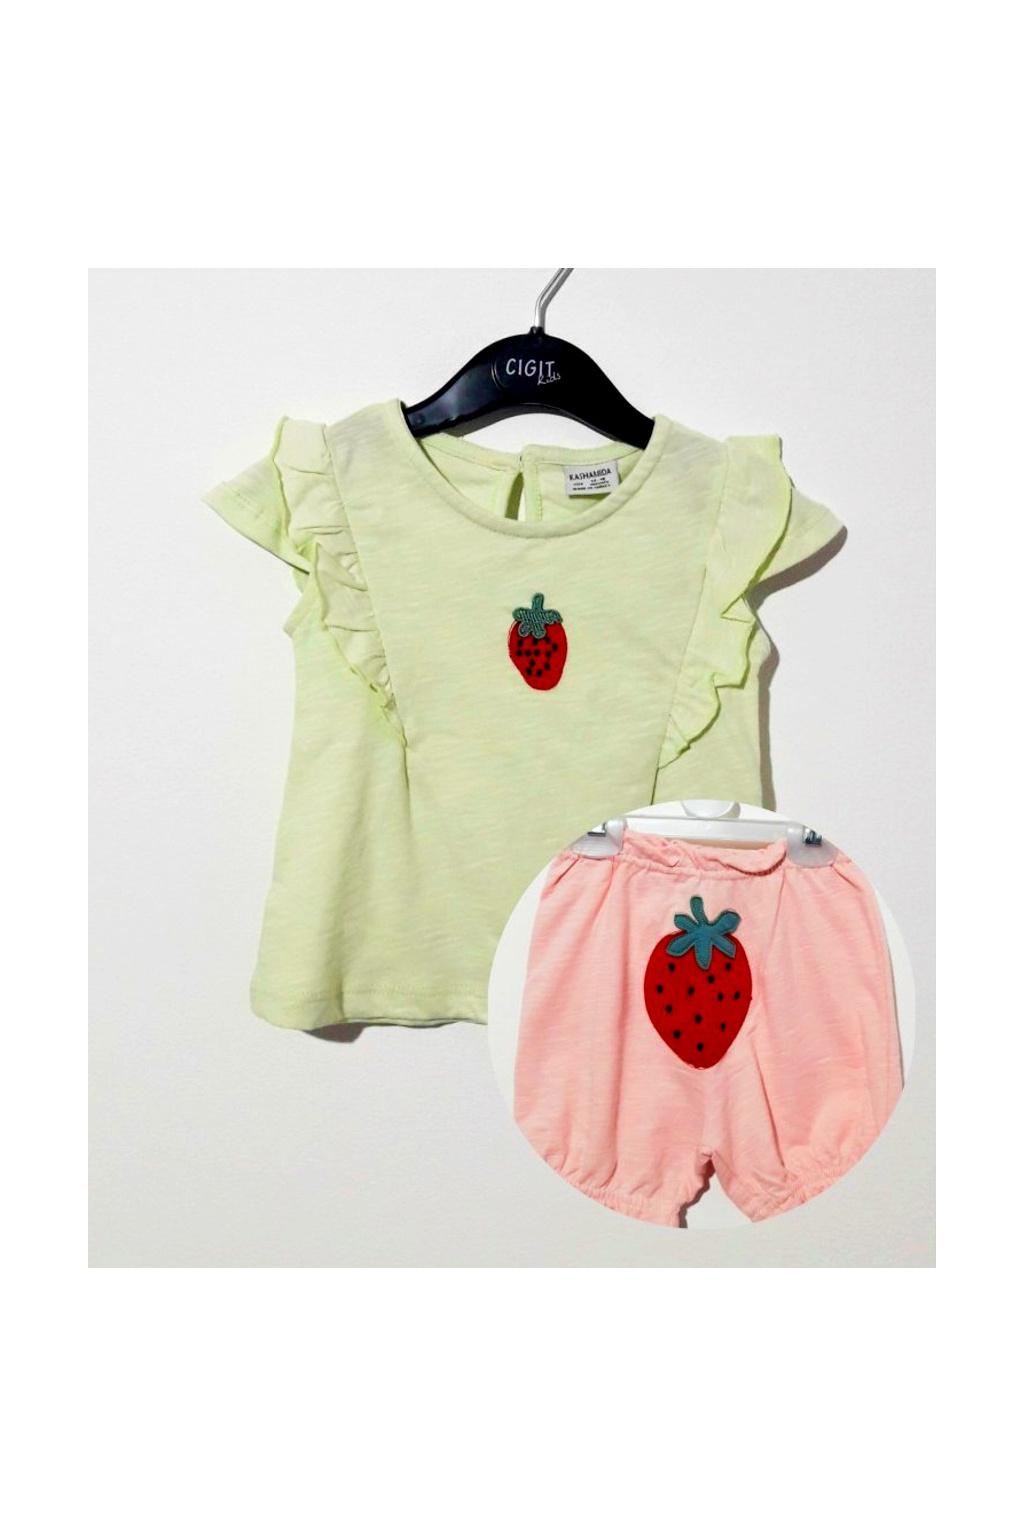 Dívčí set tričko a šortky